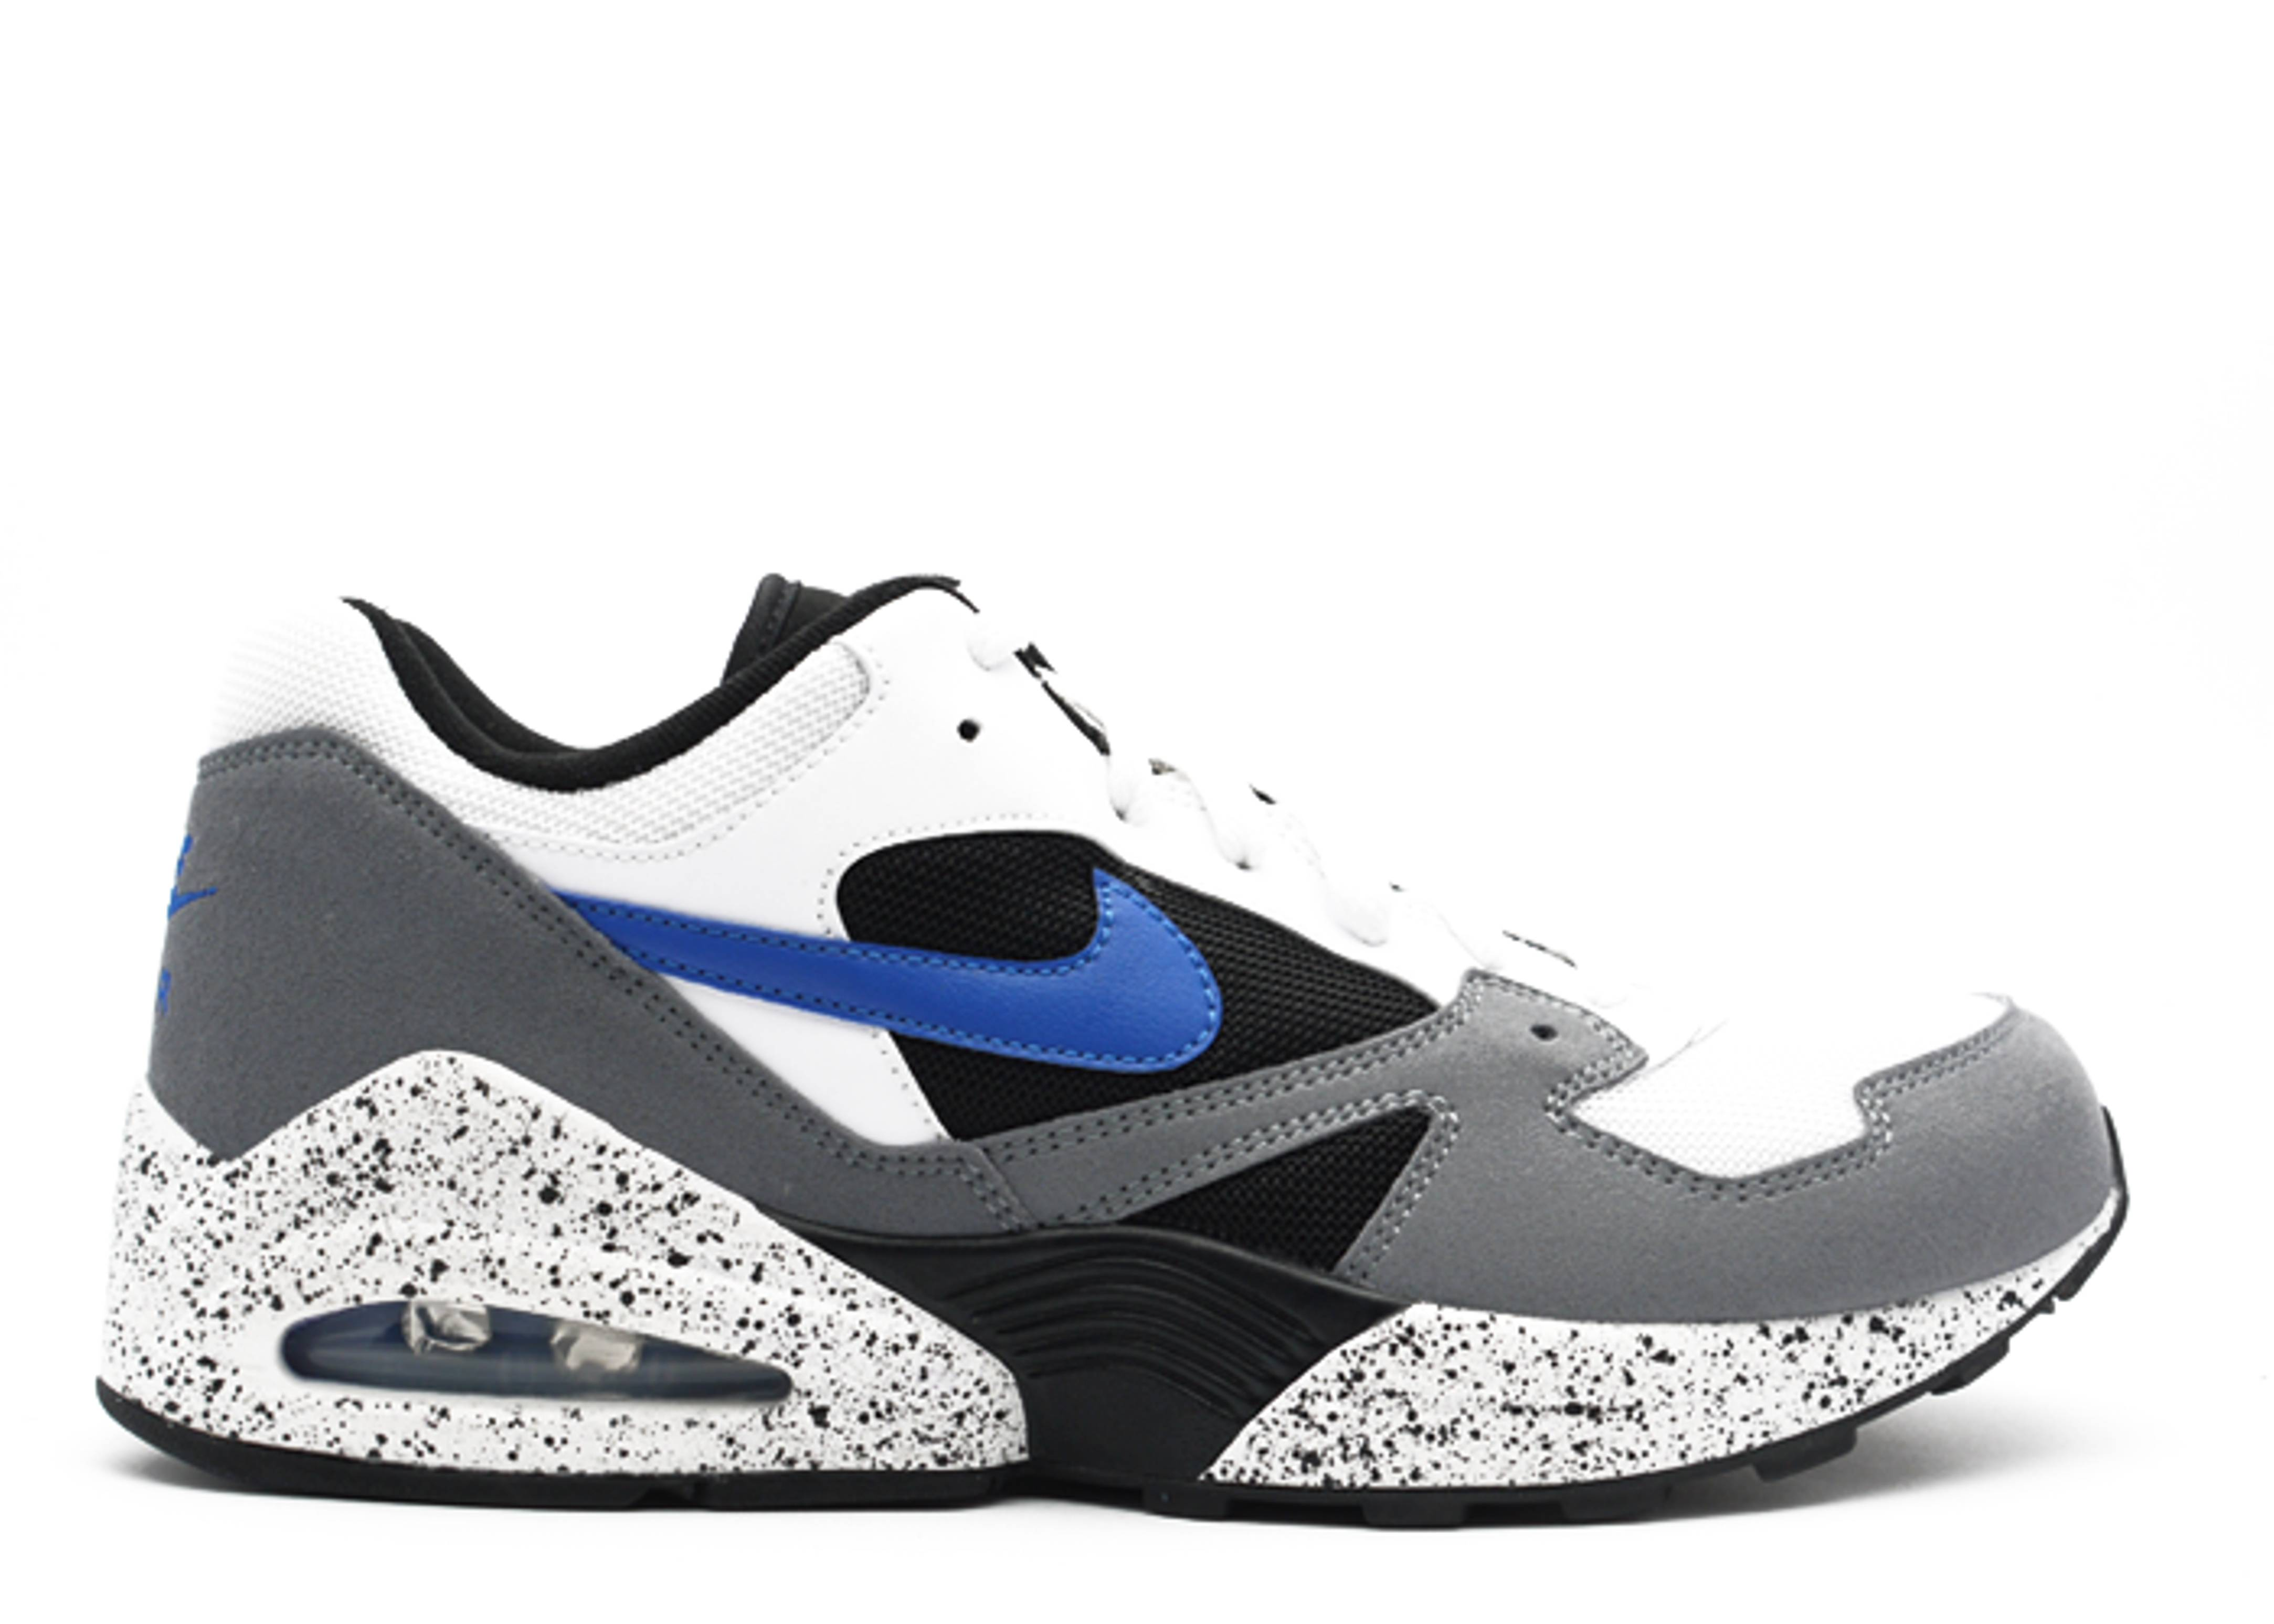 online store d0987 0497b Air Tailwind 92 - Nike - 336611 141 - white/vrsty ryl-blck ...